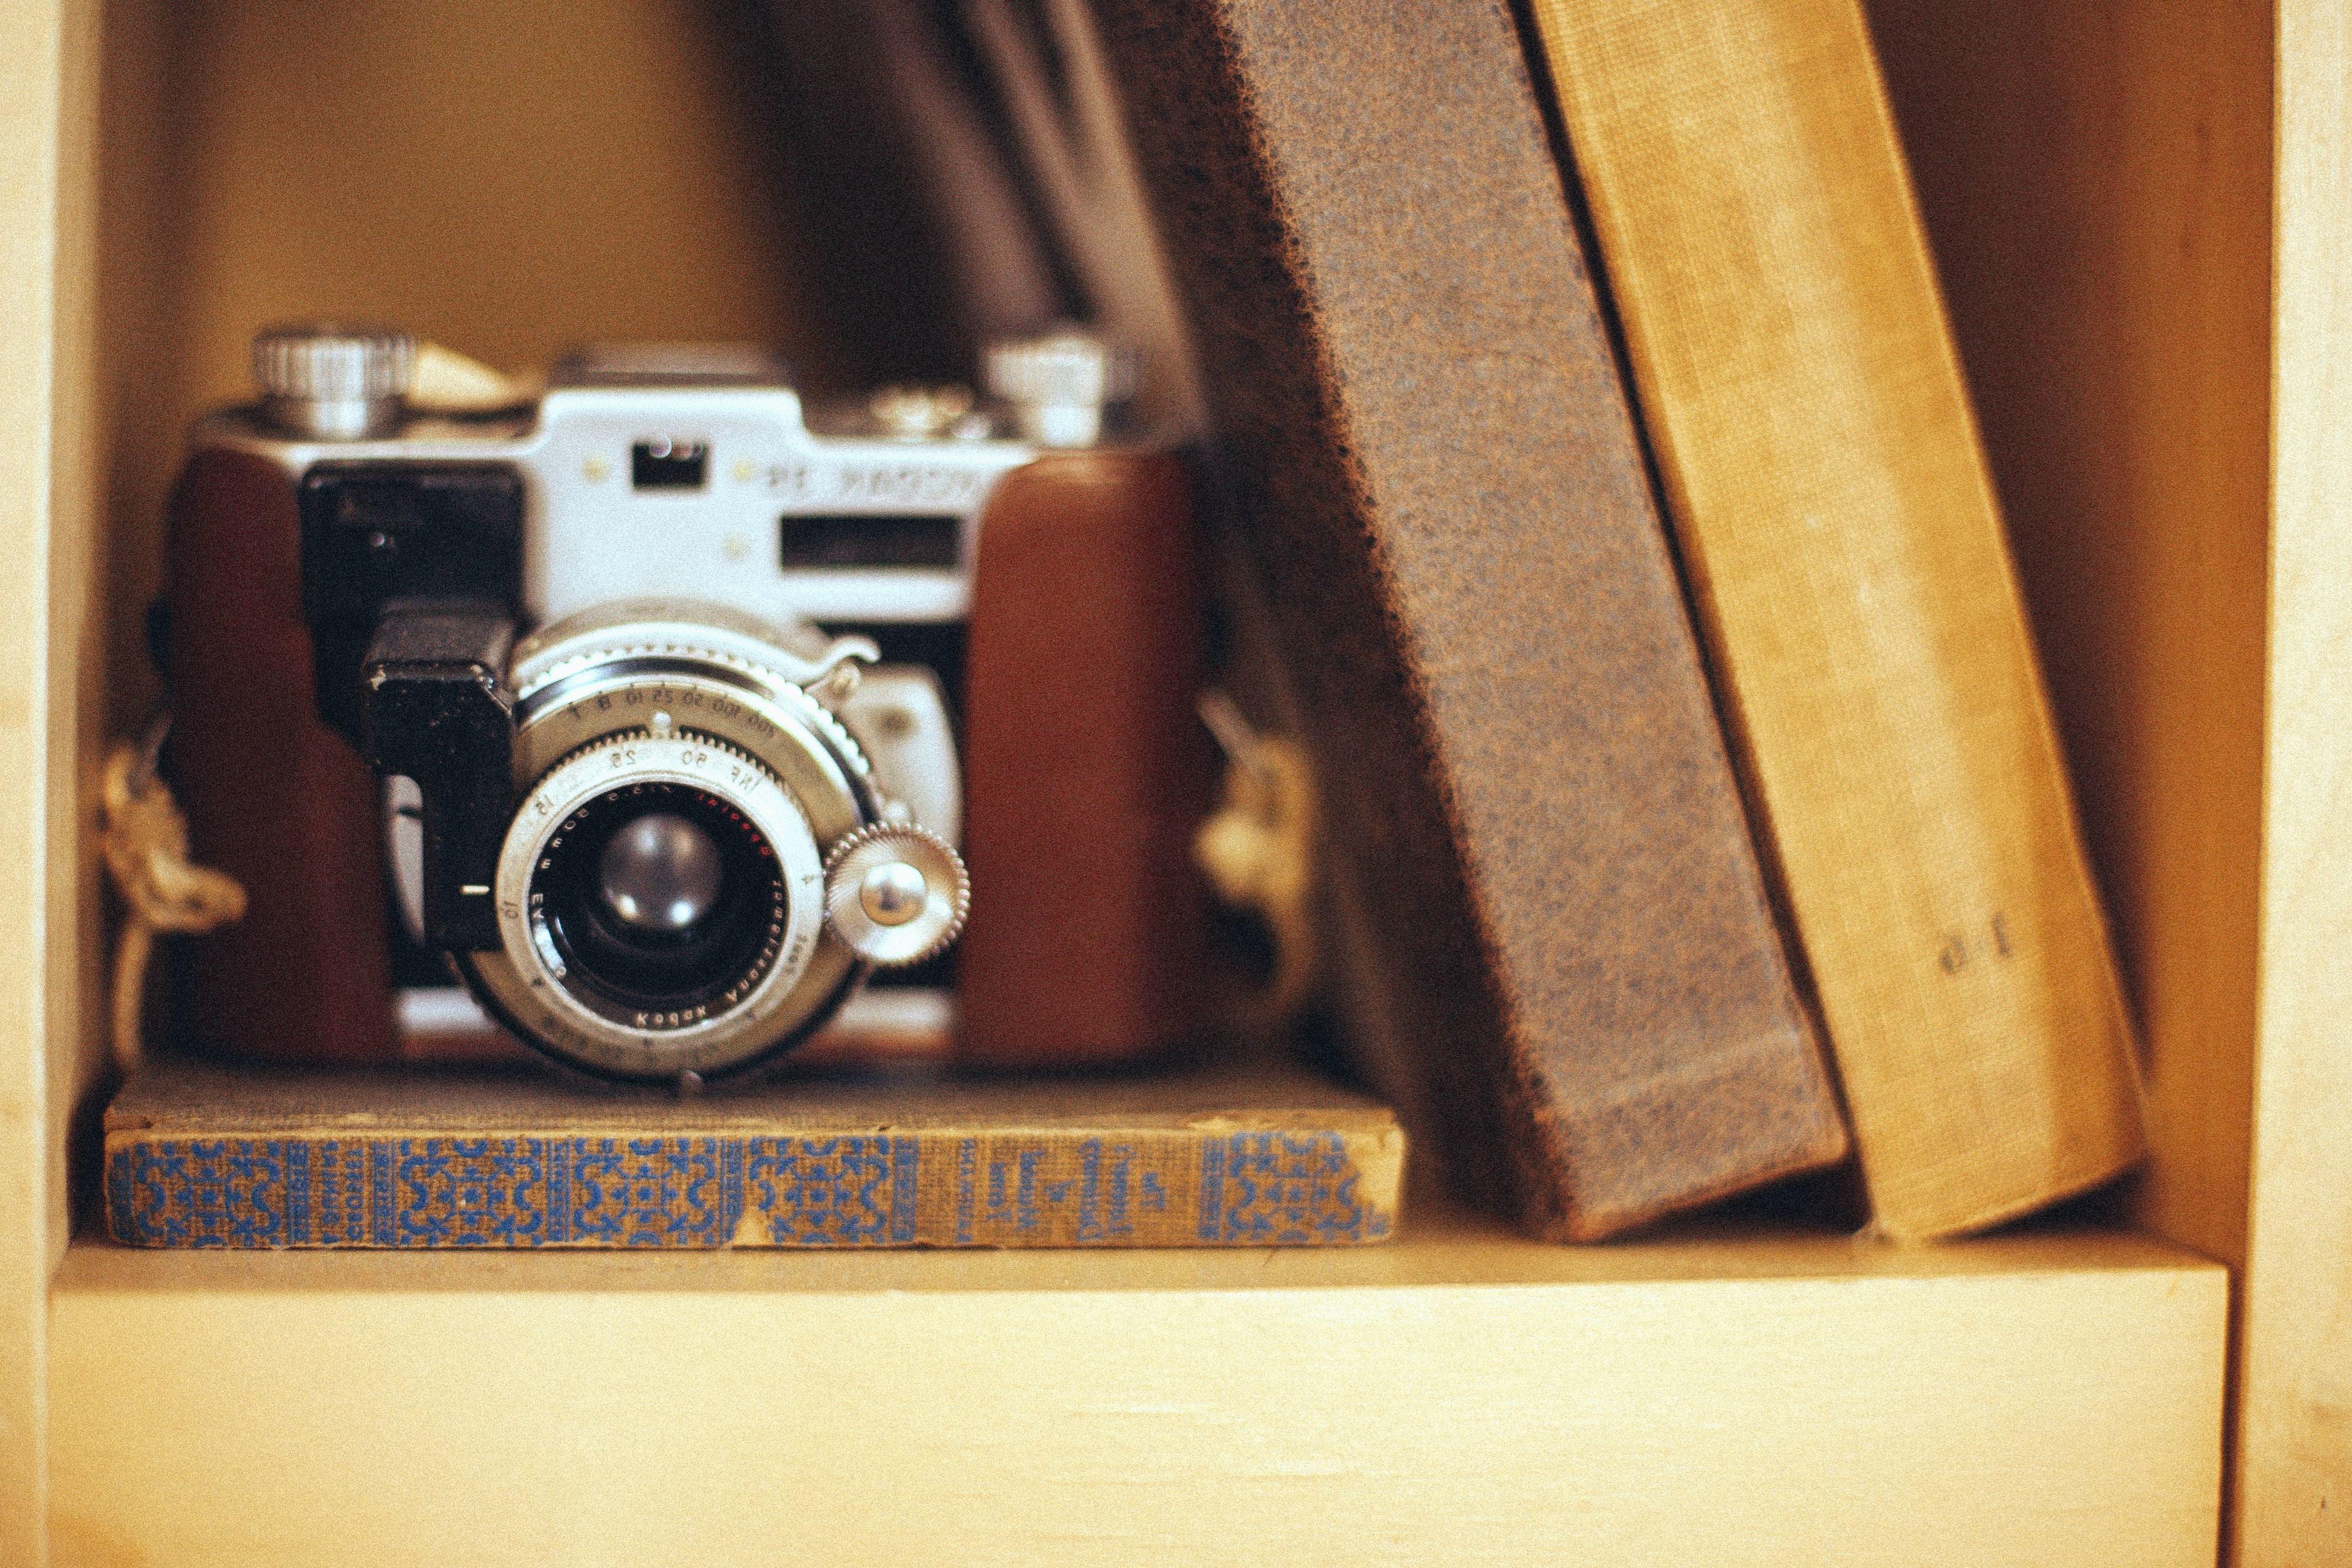 Free picture: retro, photo camera, lens, leather, album, cabinet, wood